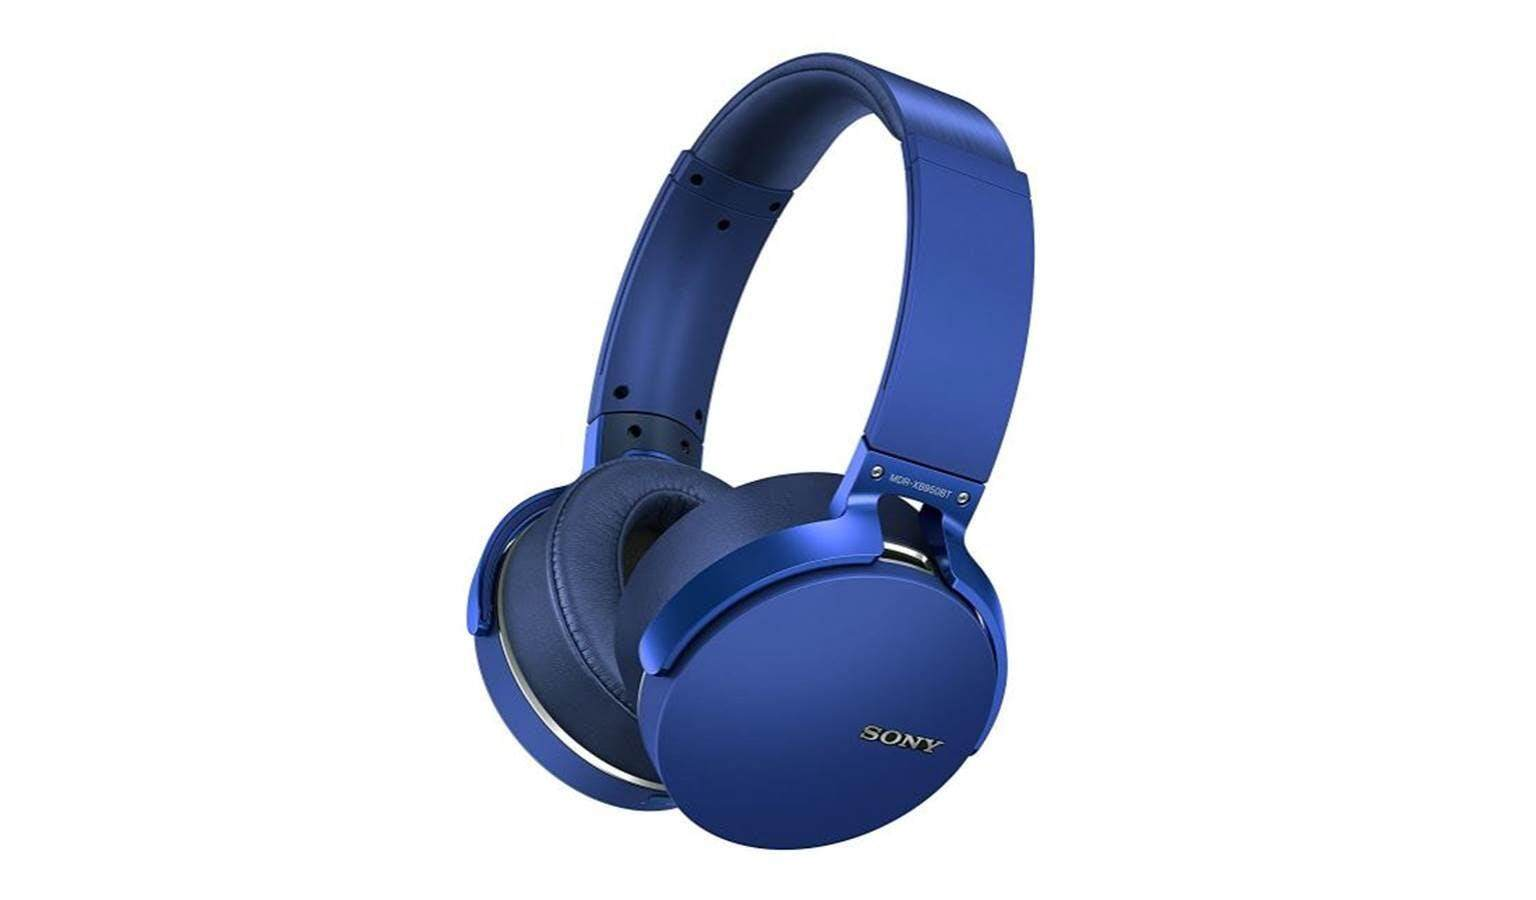 Sony Wireless Headphones Bluetooth Bass Price In Singapore Earphone Mdr Xb70bt Extra Xb950b1